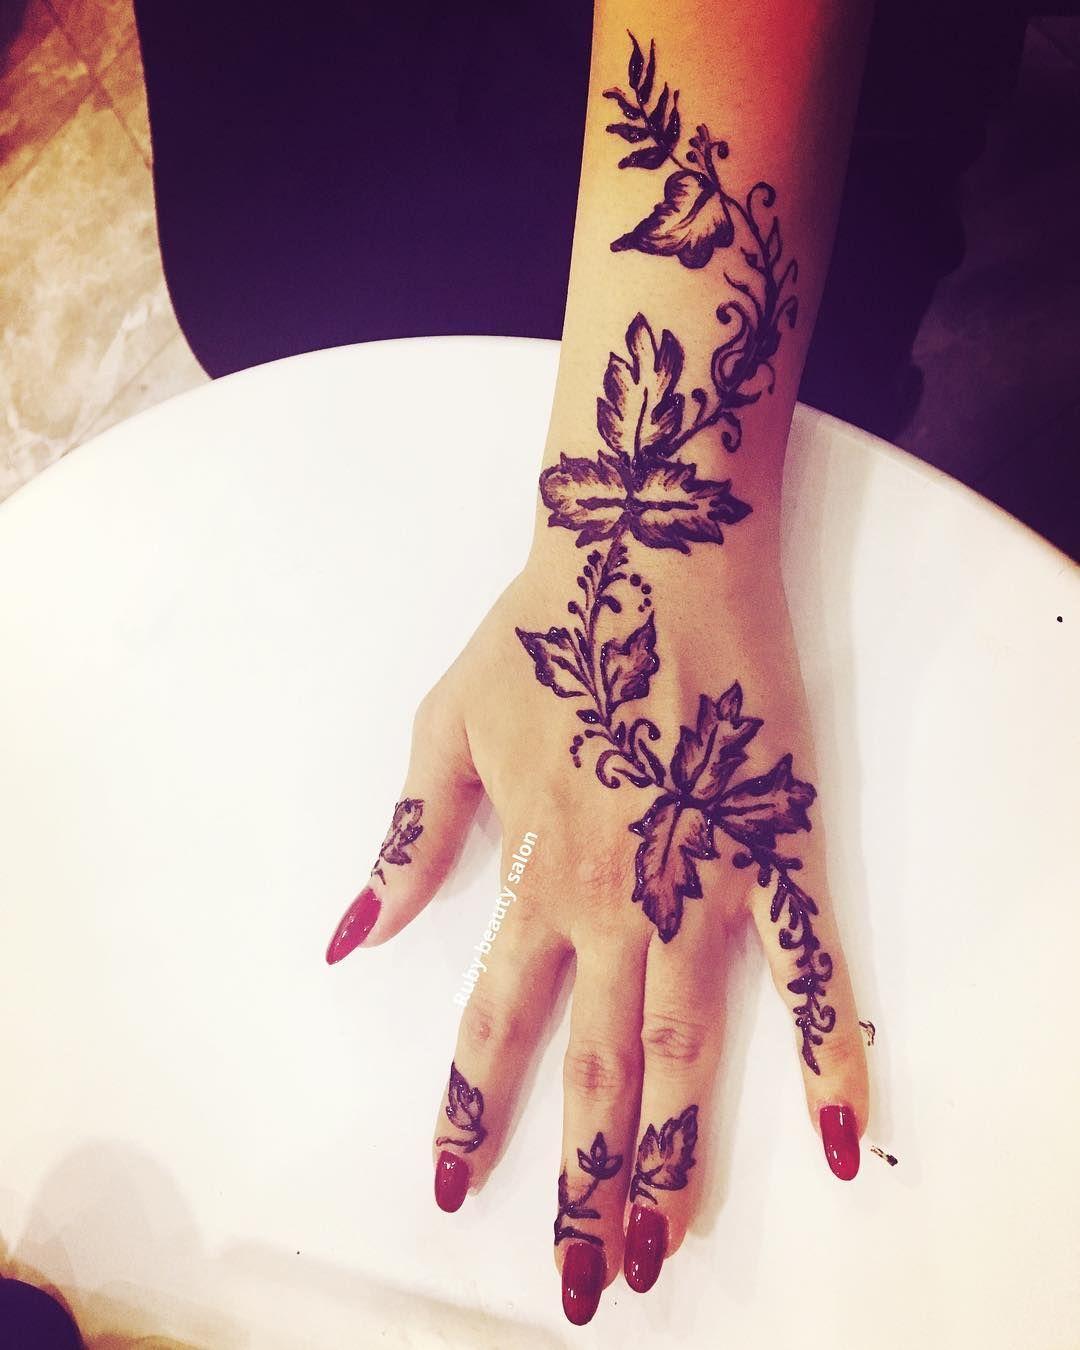 Hennatattoo Tattoo Henna Khobar Beautiful Intricate Shoulderhenna Shouldertattoos حناء تيتو الخبر ح Hand Tattoos Henna Hand Tattoo Hand Henna